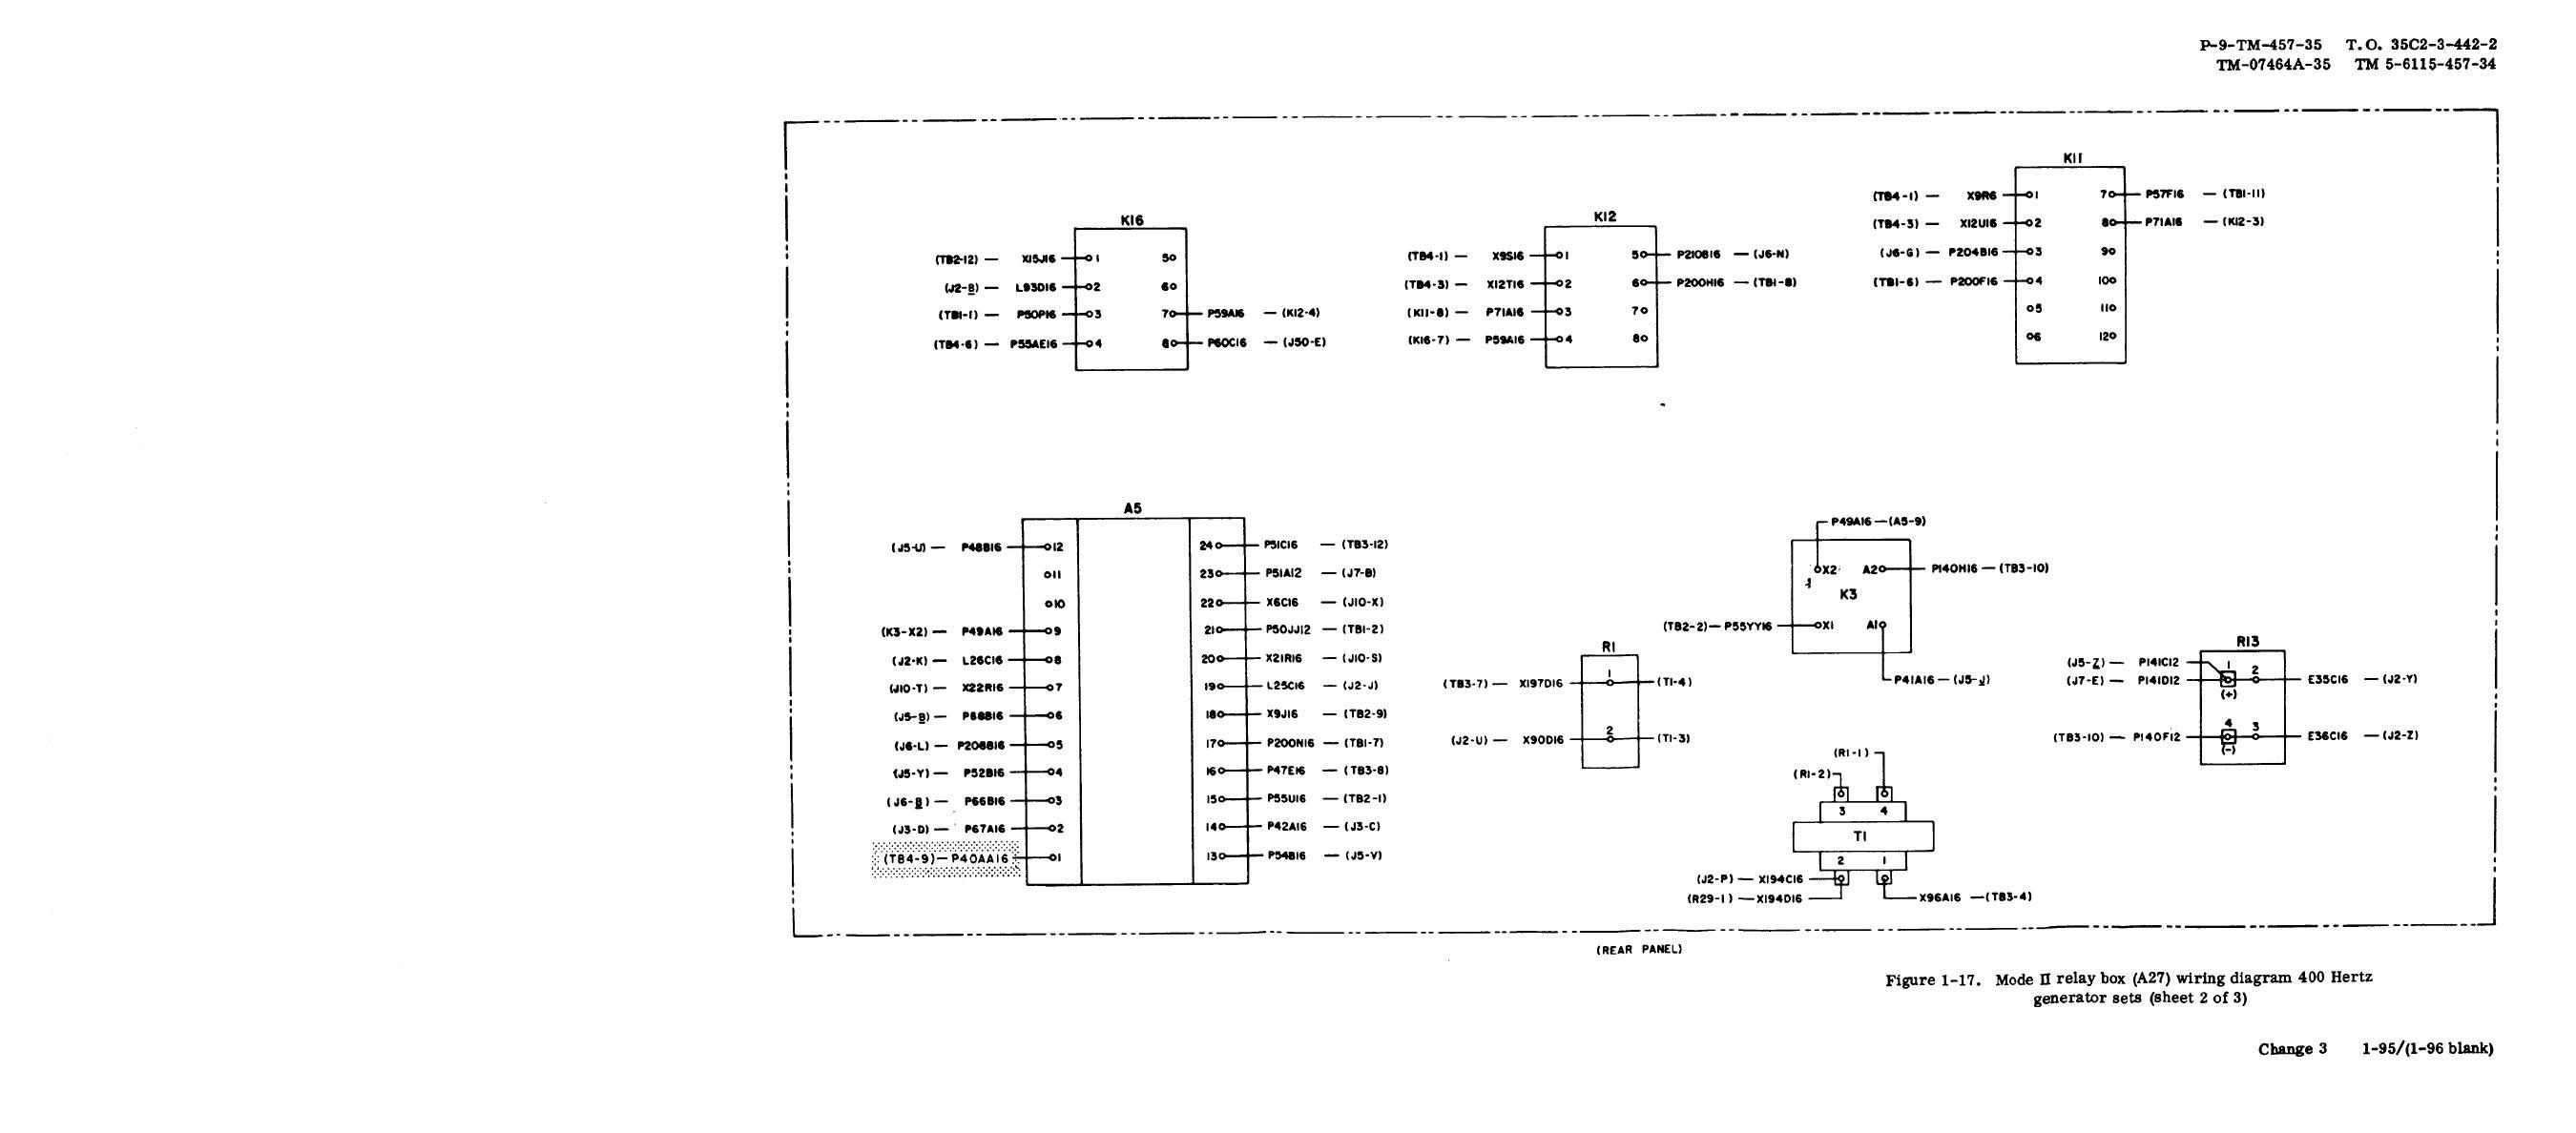 Figure 1-17. Mode II relay box (A27) wiring diagram 400 ... on